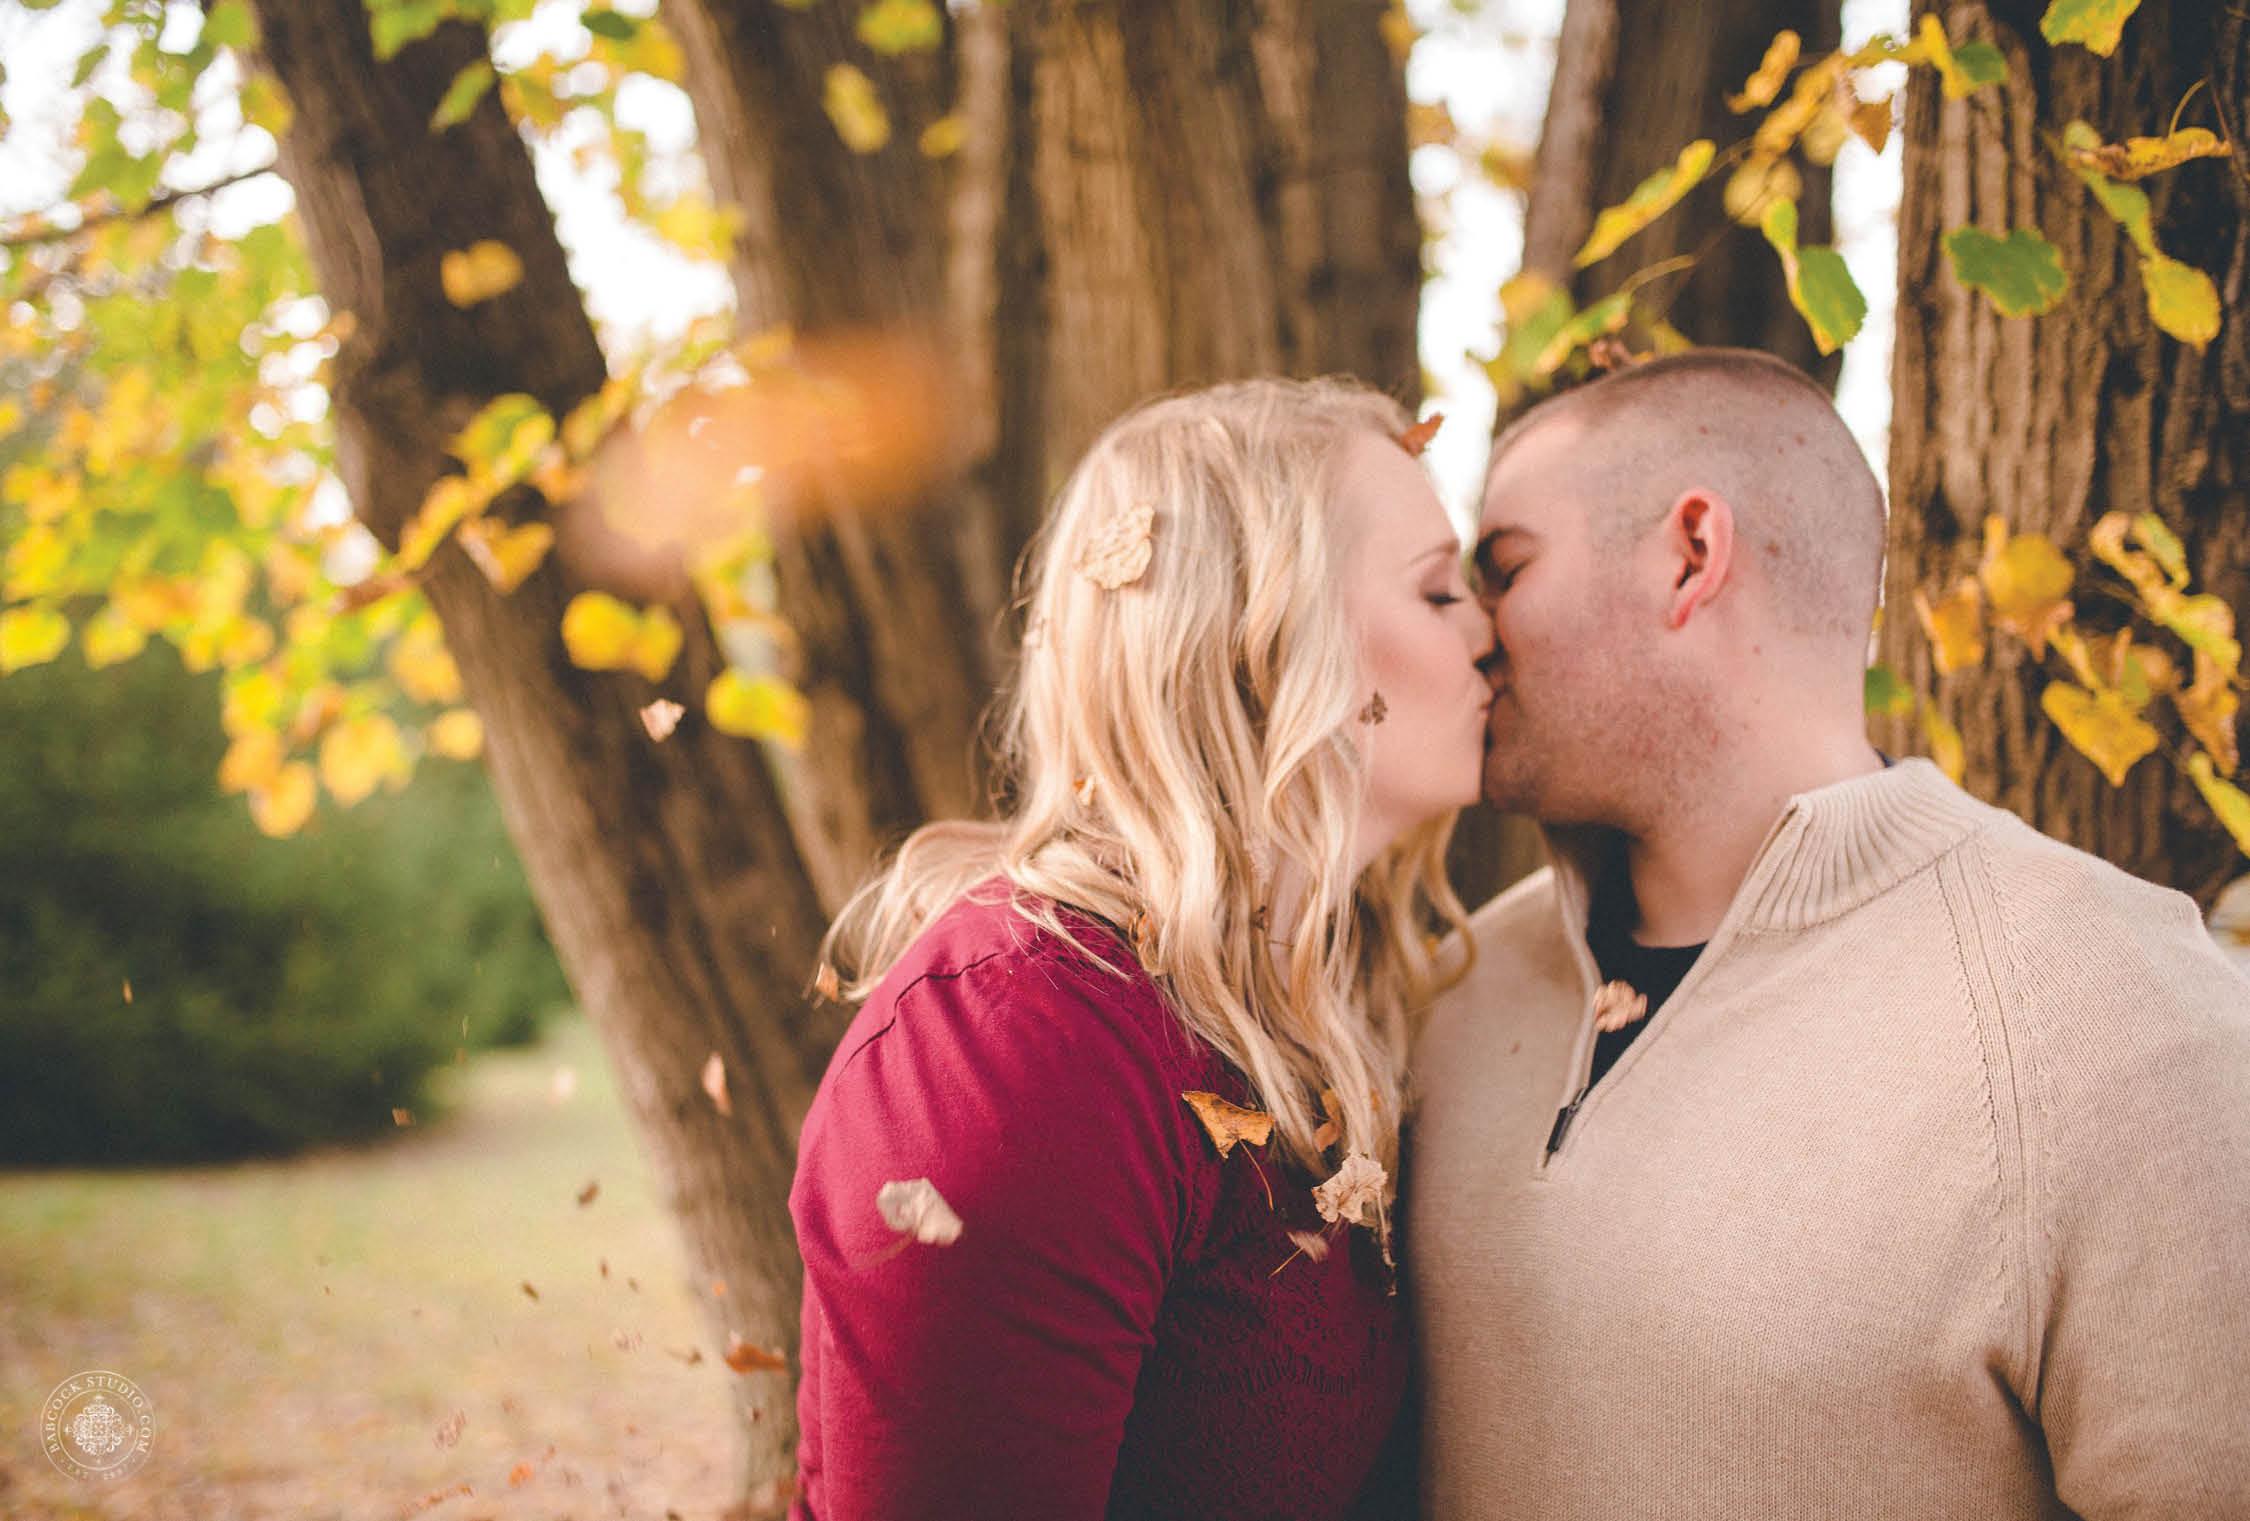 sarah-justin-engagement-photographer-dayton-ohio-8.jpg